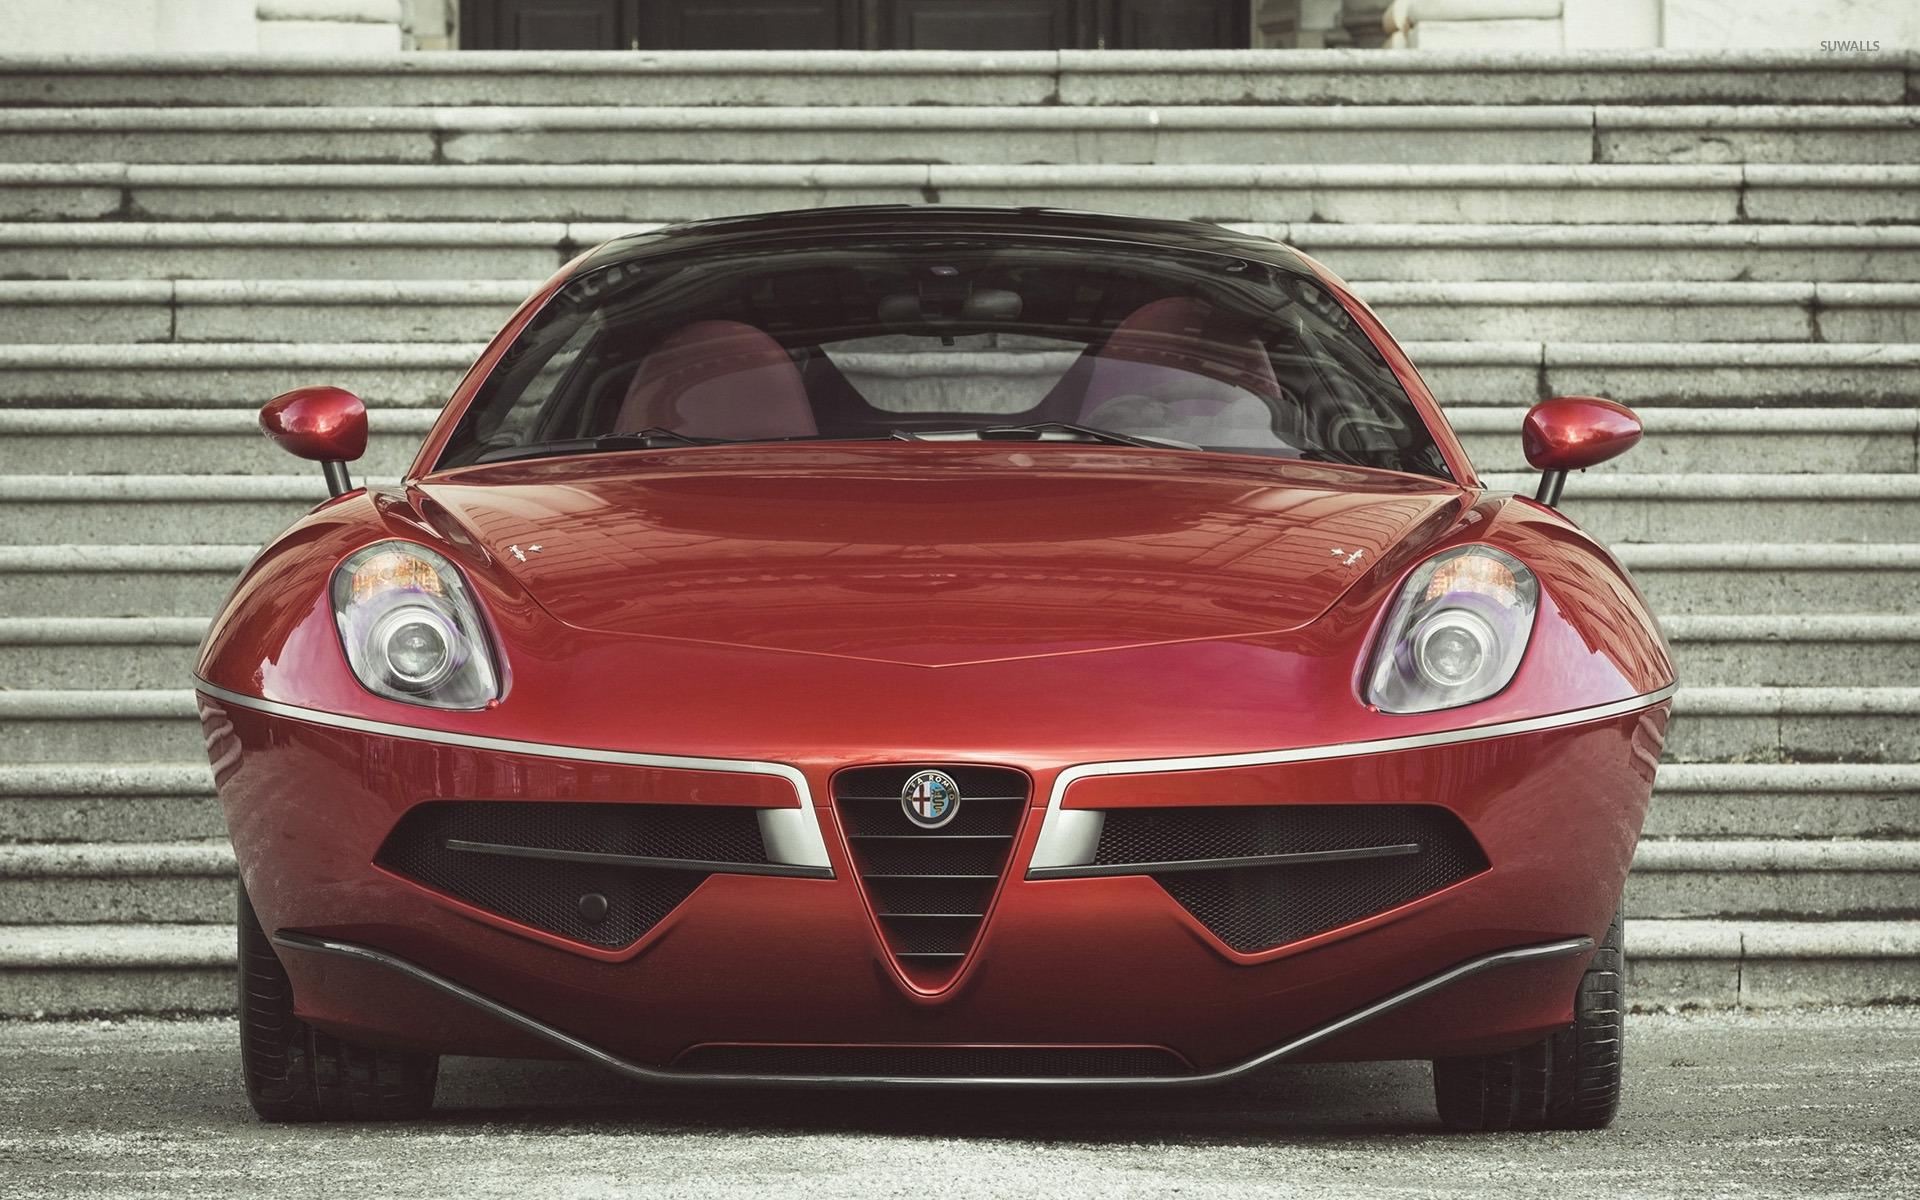 2012 Alfa Romeo Disco Volante [14] Wallpaper 1920x1200 Jpg